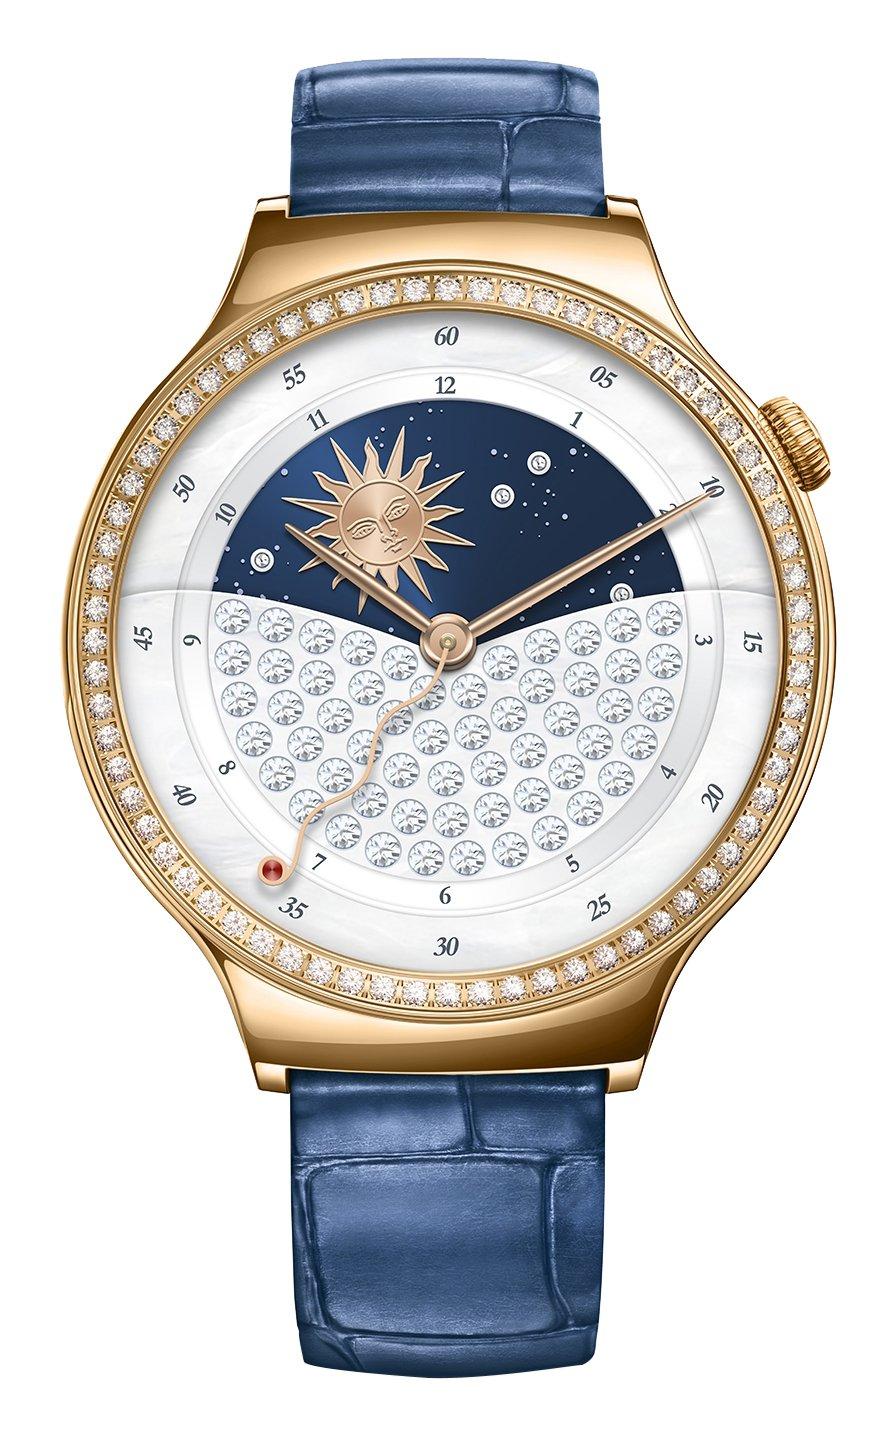 Huawei 55021238 Jewel Smartwatch mit Lederarmband - Edelstahl rosegold-blau